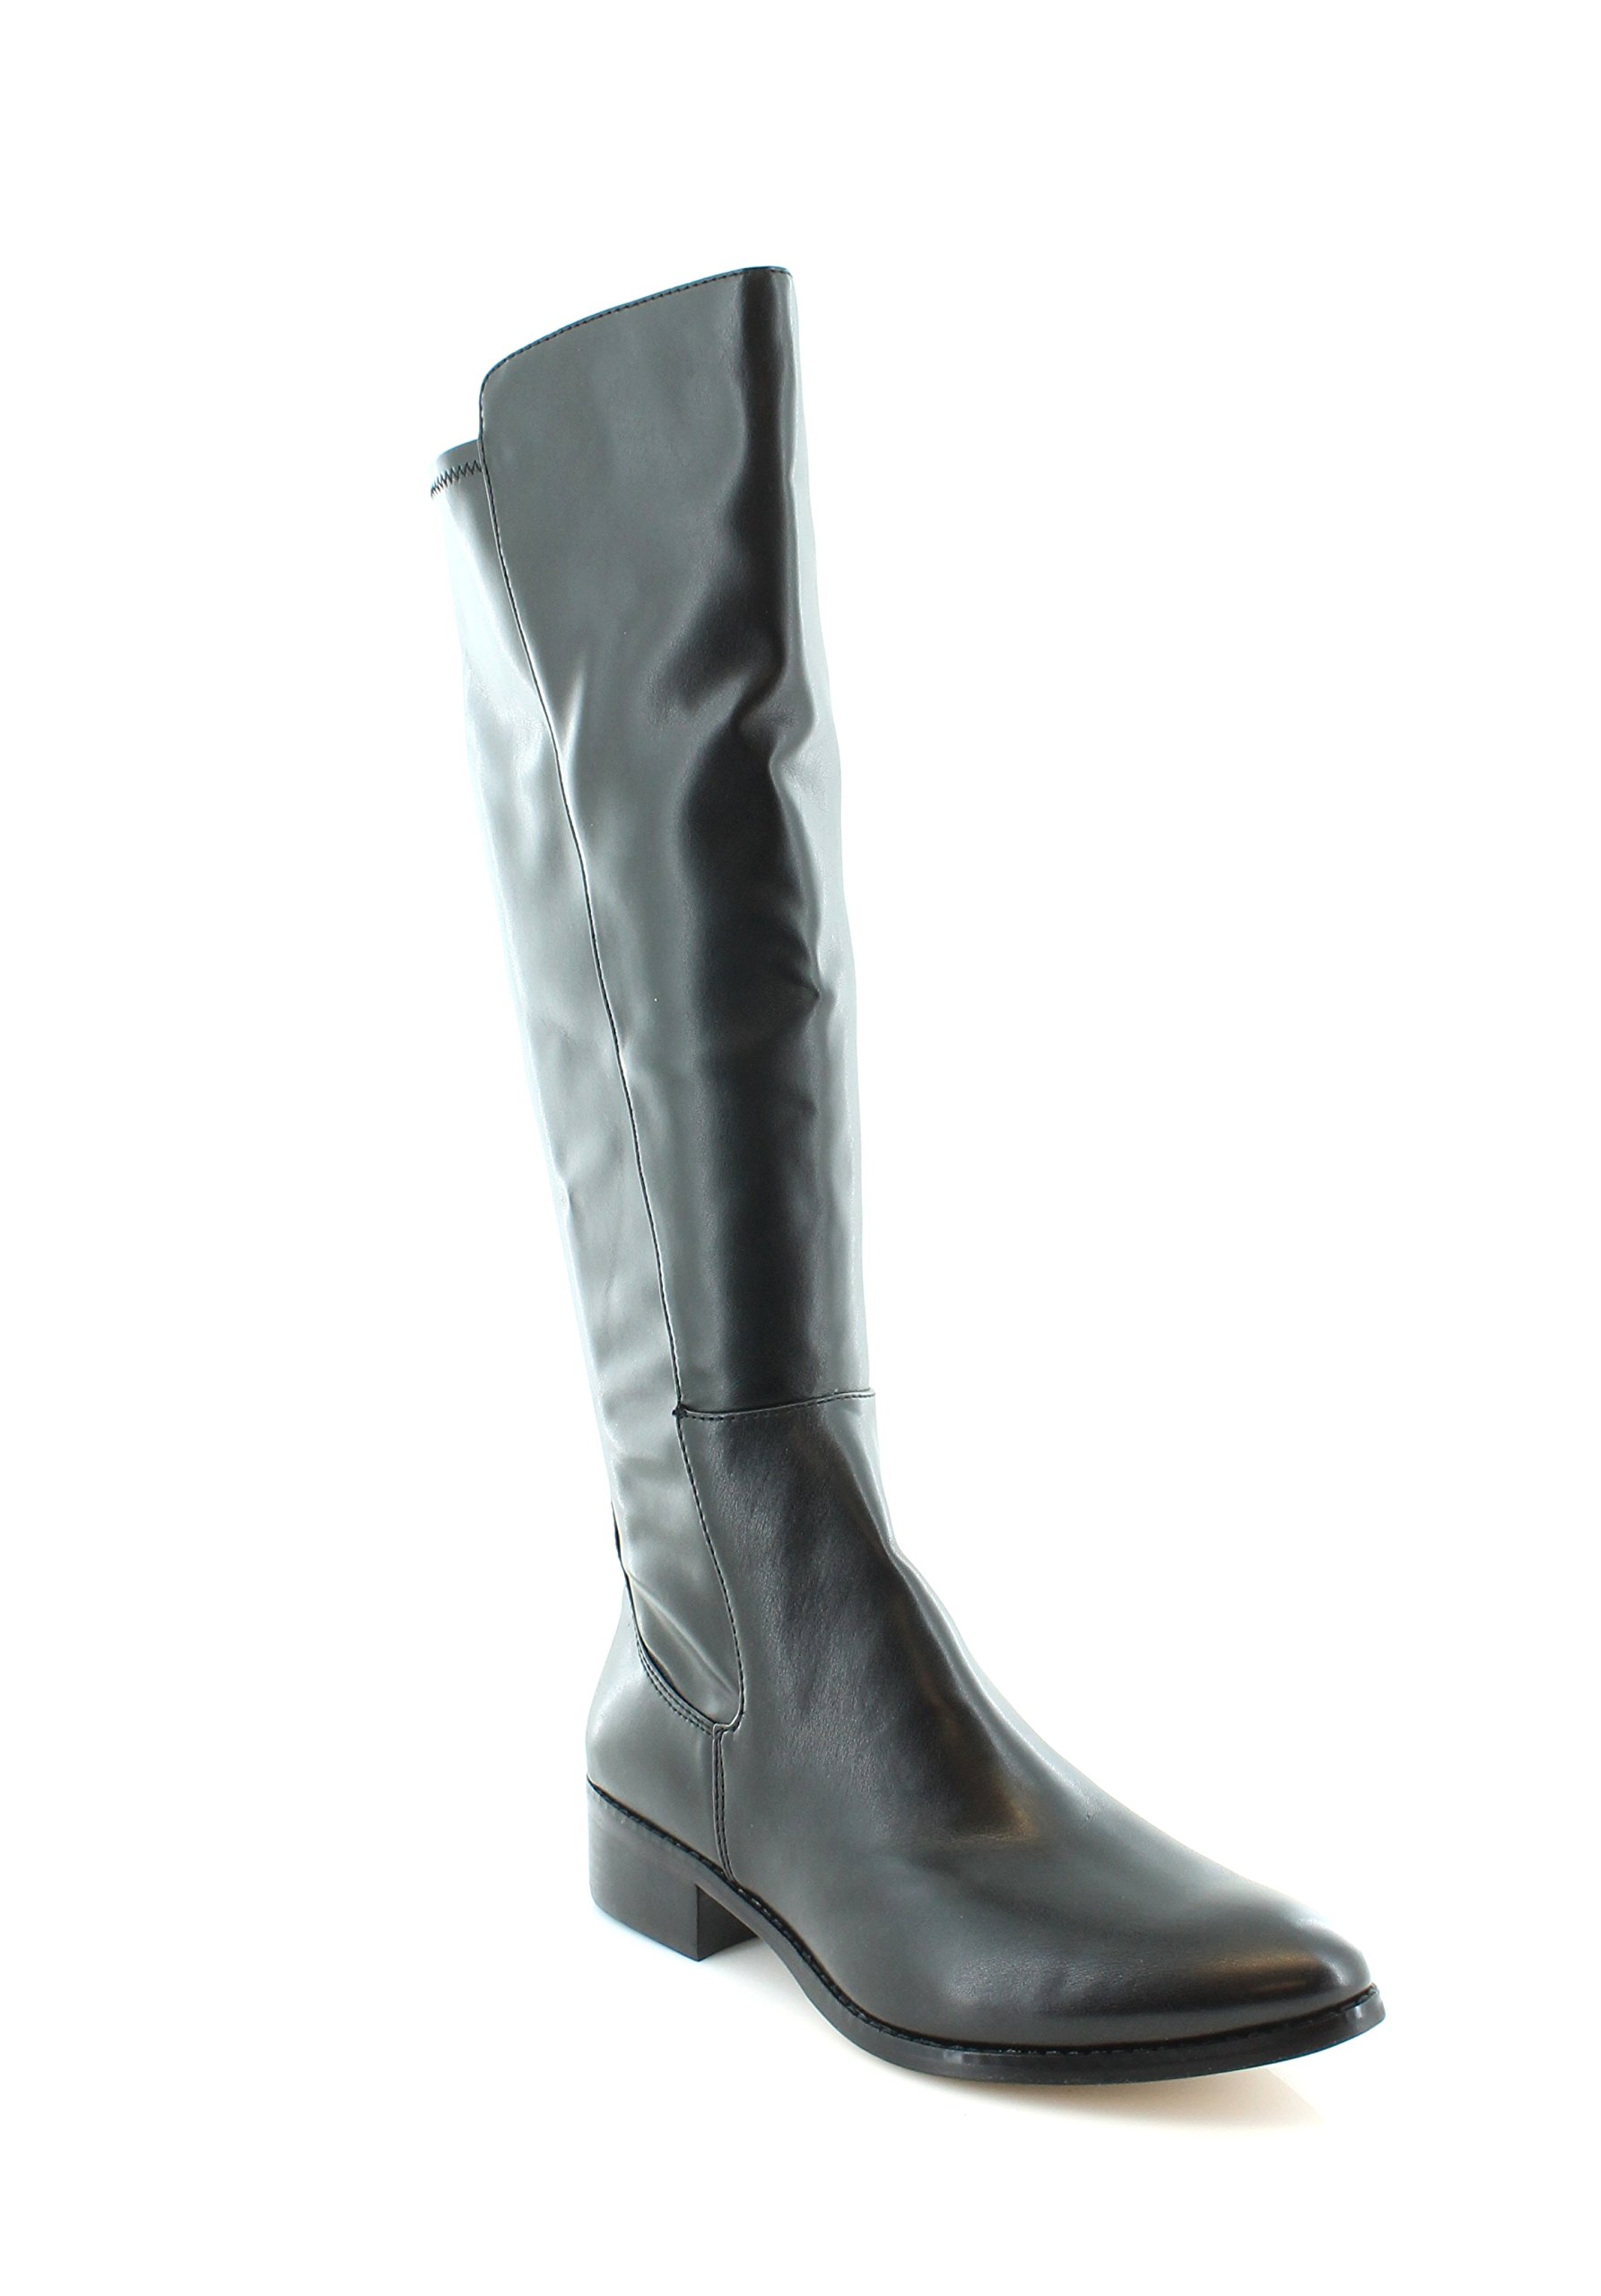 Donald J Pliner Nita Women's Boots Black Size 6 M